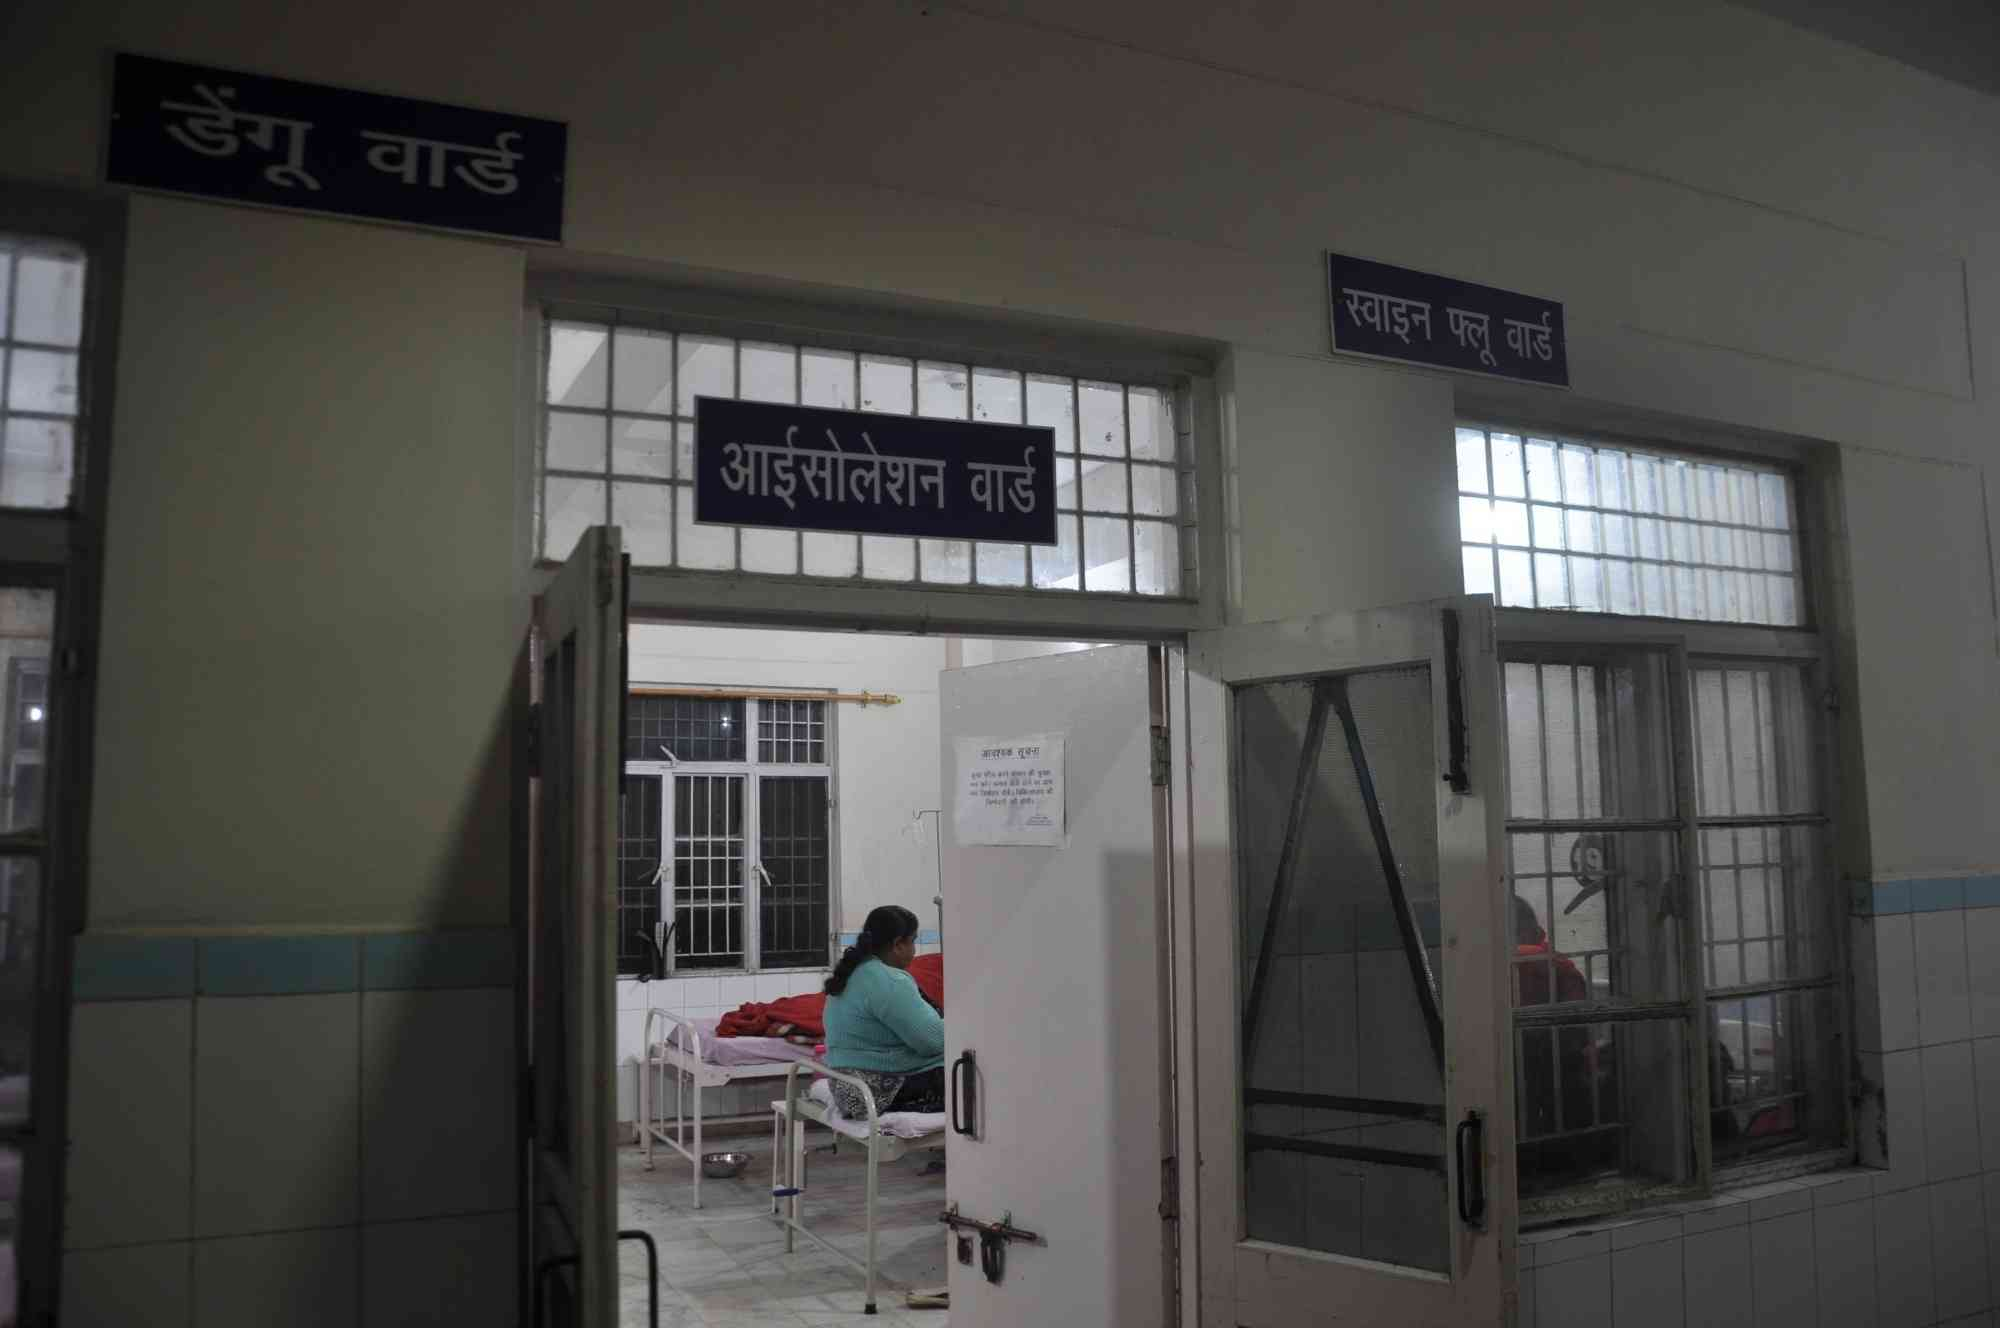 An isolation ward for swine flu patients at Coronation hospital in Dehradun, Uttarakhand. (Photo credit: IANS).